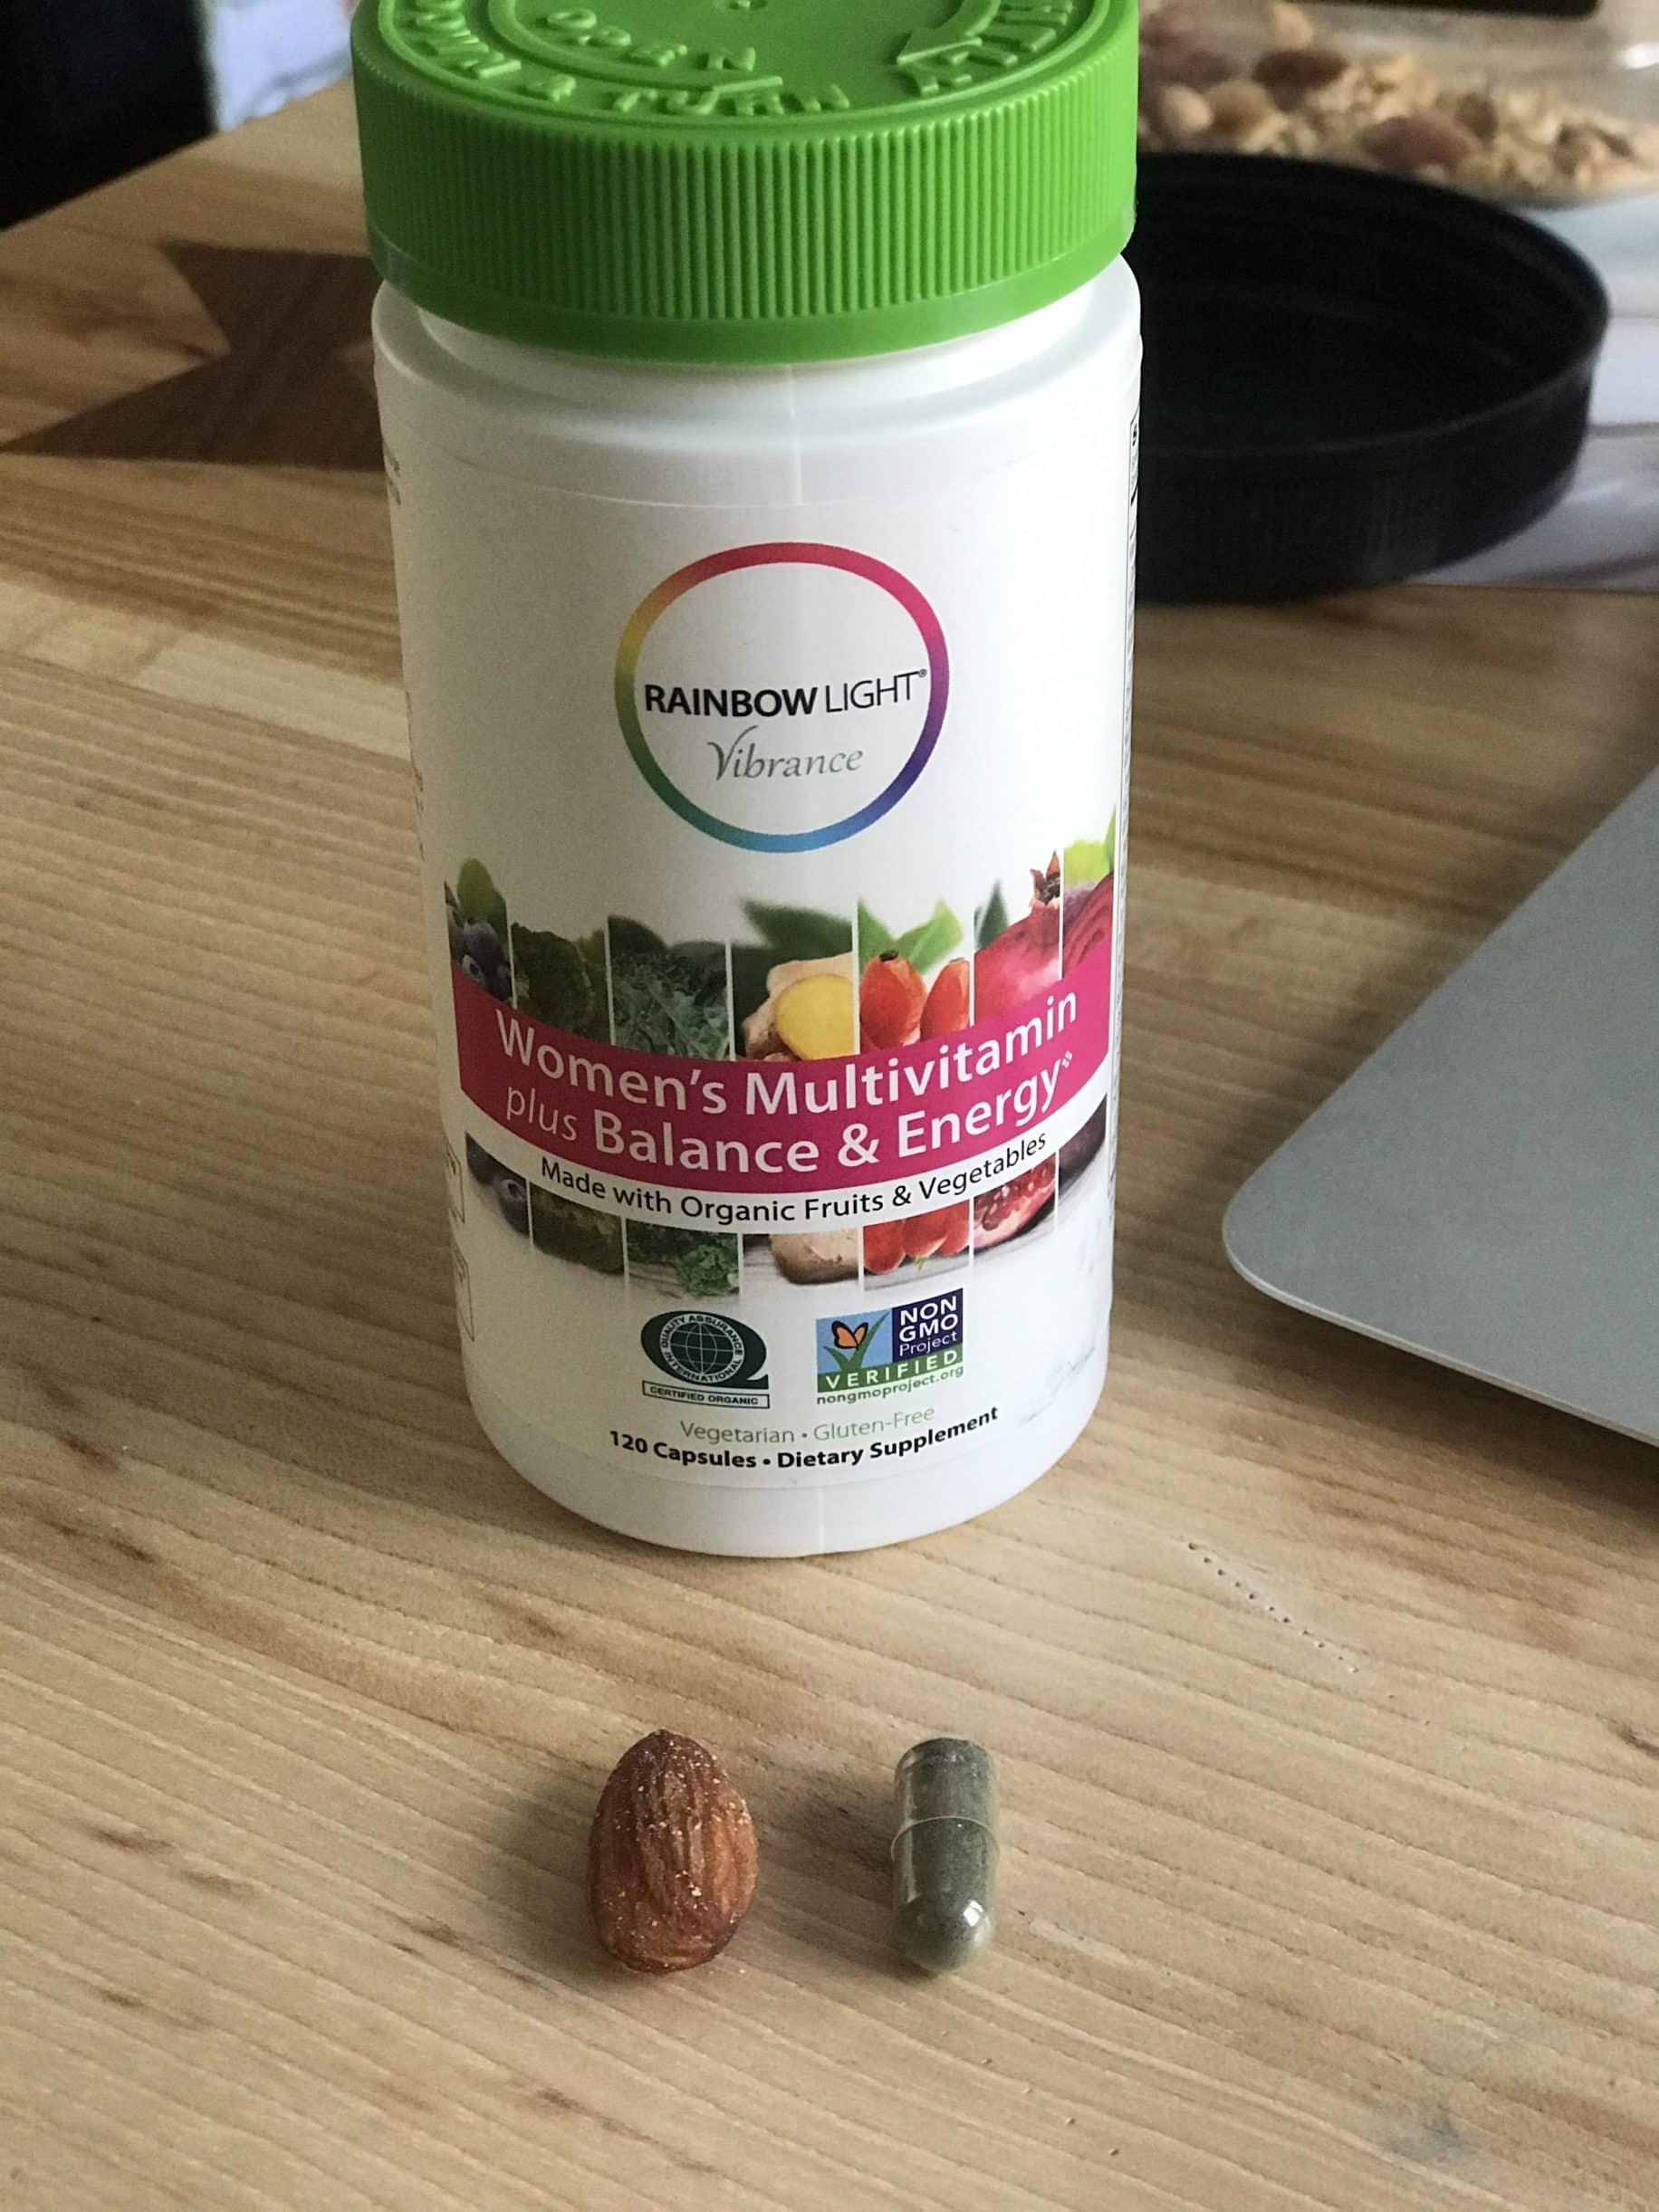 5 Best Women's Multivitamins 2019  Top Vitamin Supplements